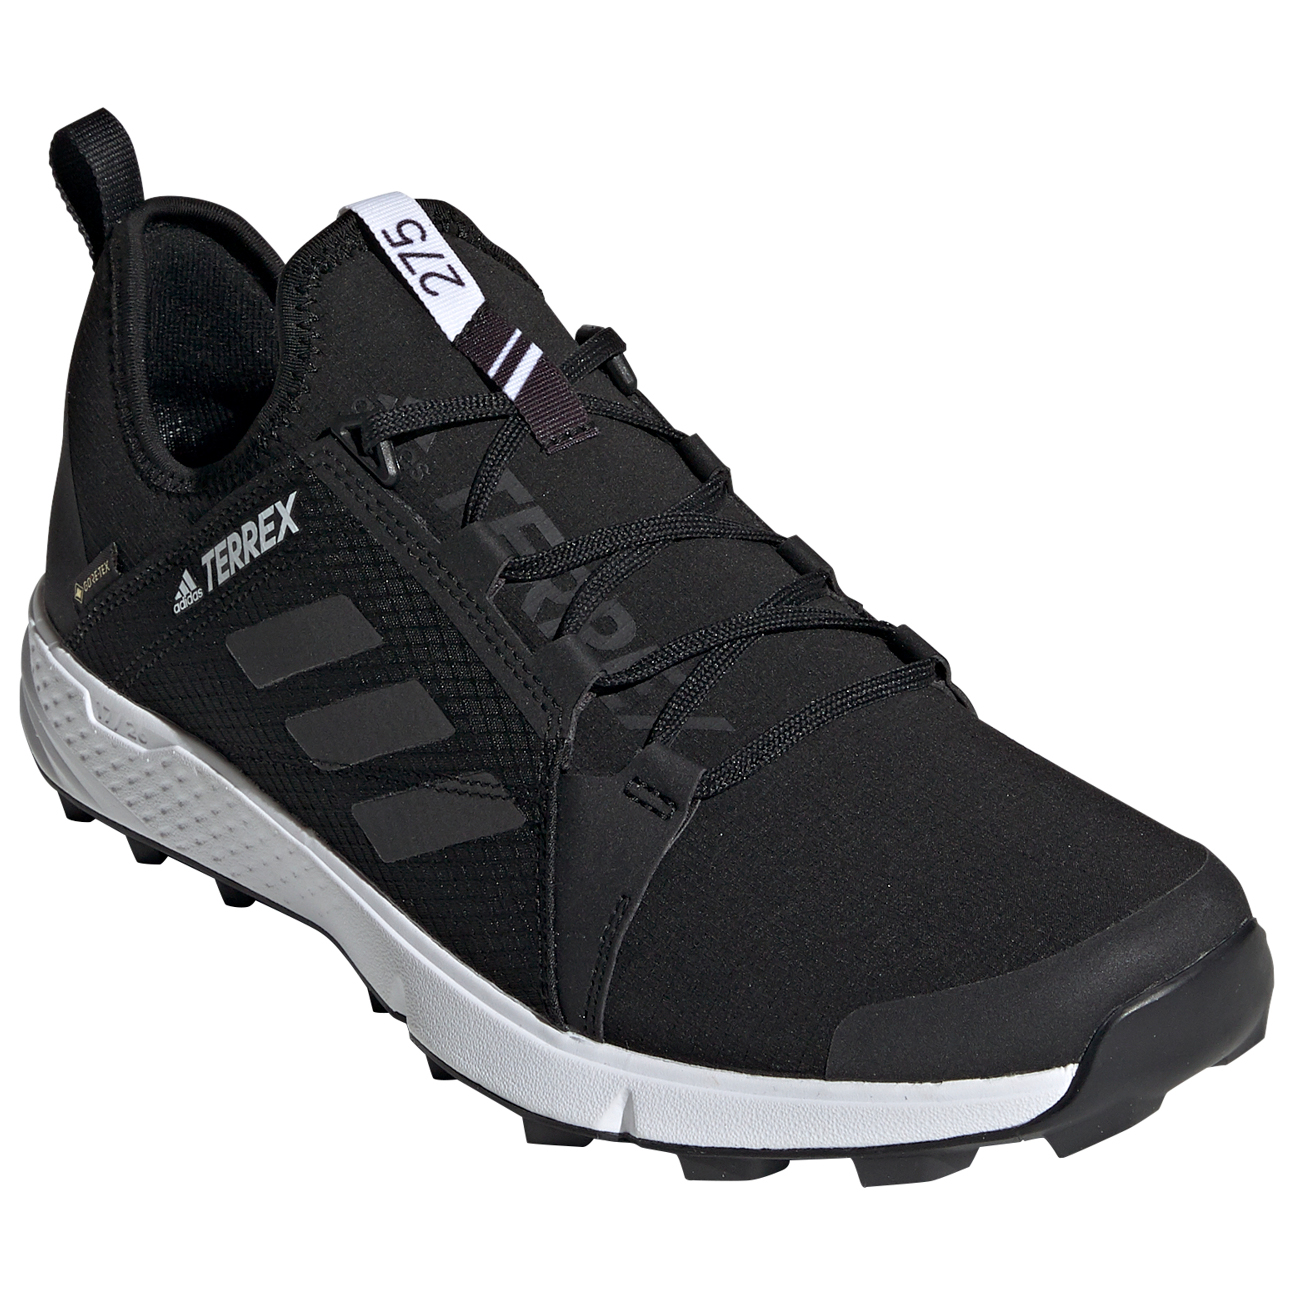 adidas Terrex Speed GTX Mens Trail Running Shoes Gore Tex